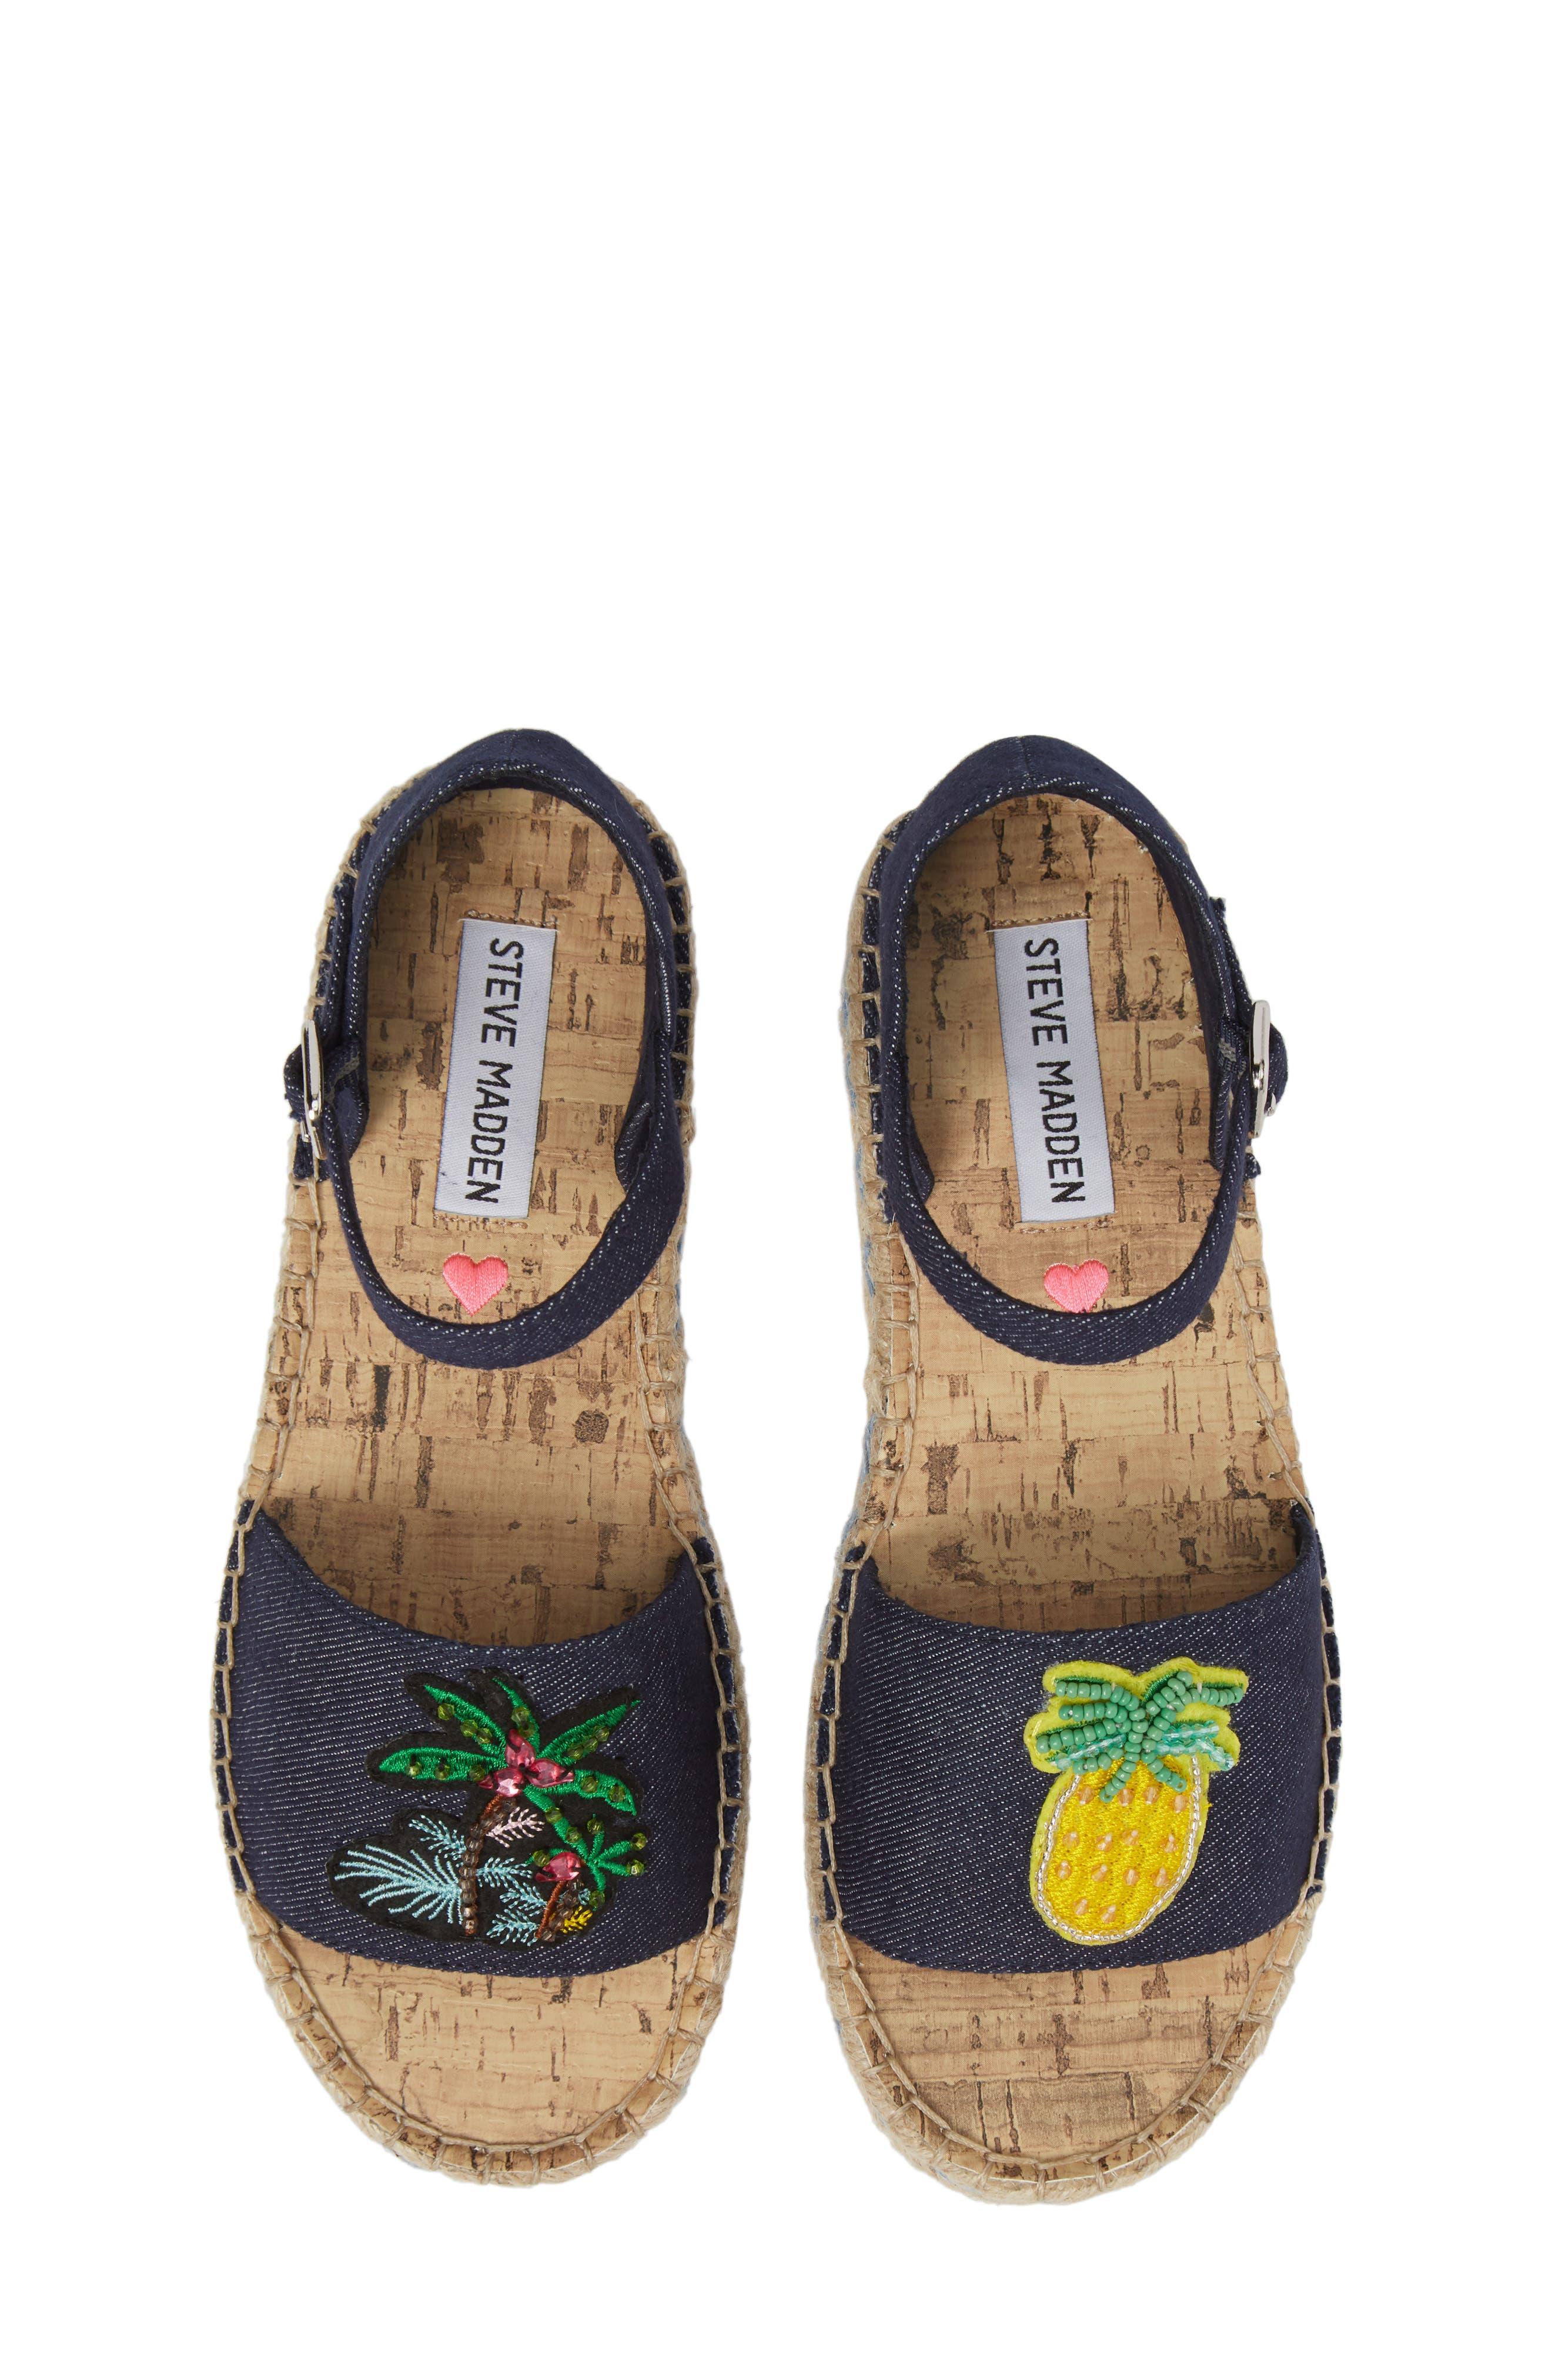 JLUAO Tropical Embellished Sandal,                             Main thumbnail 1, color,                             001